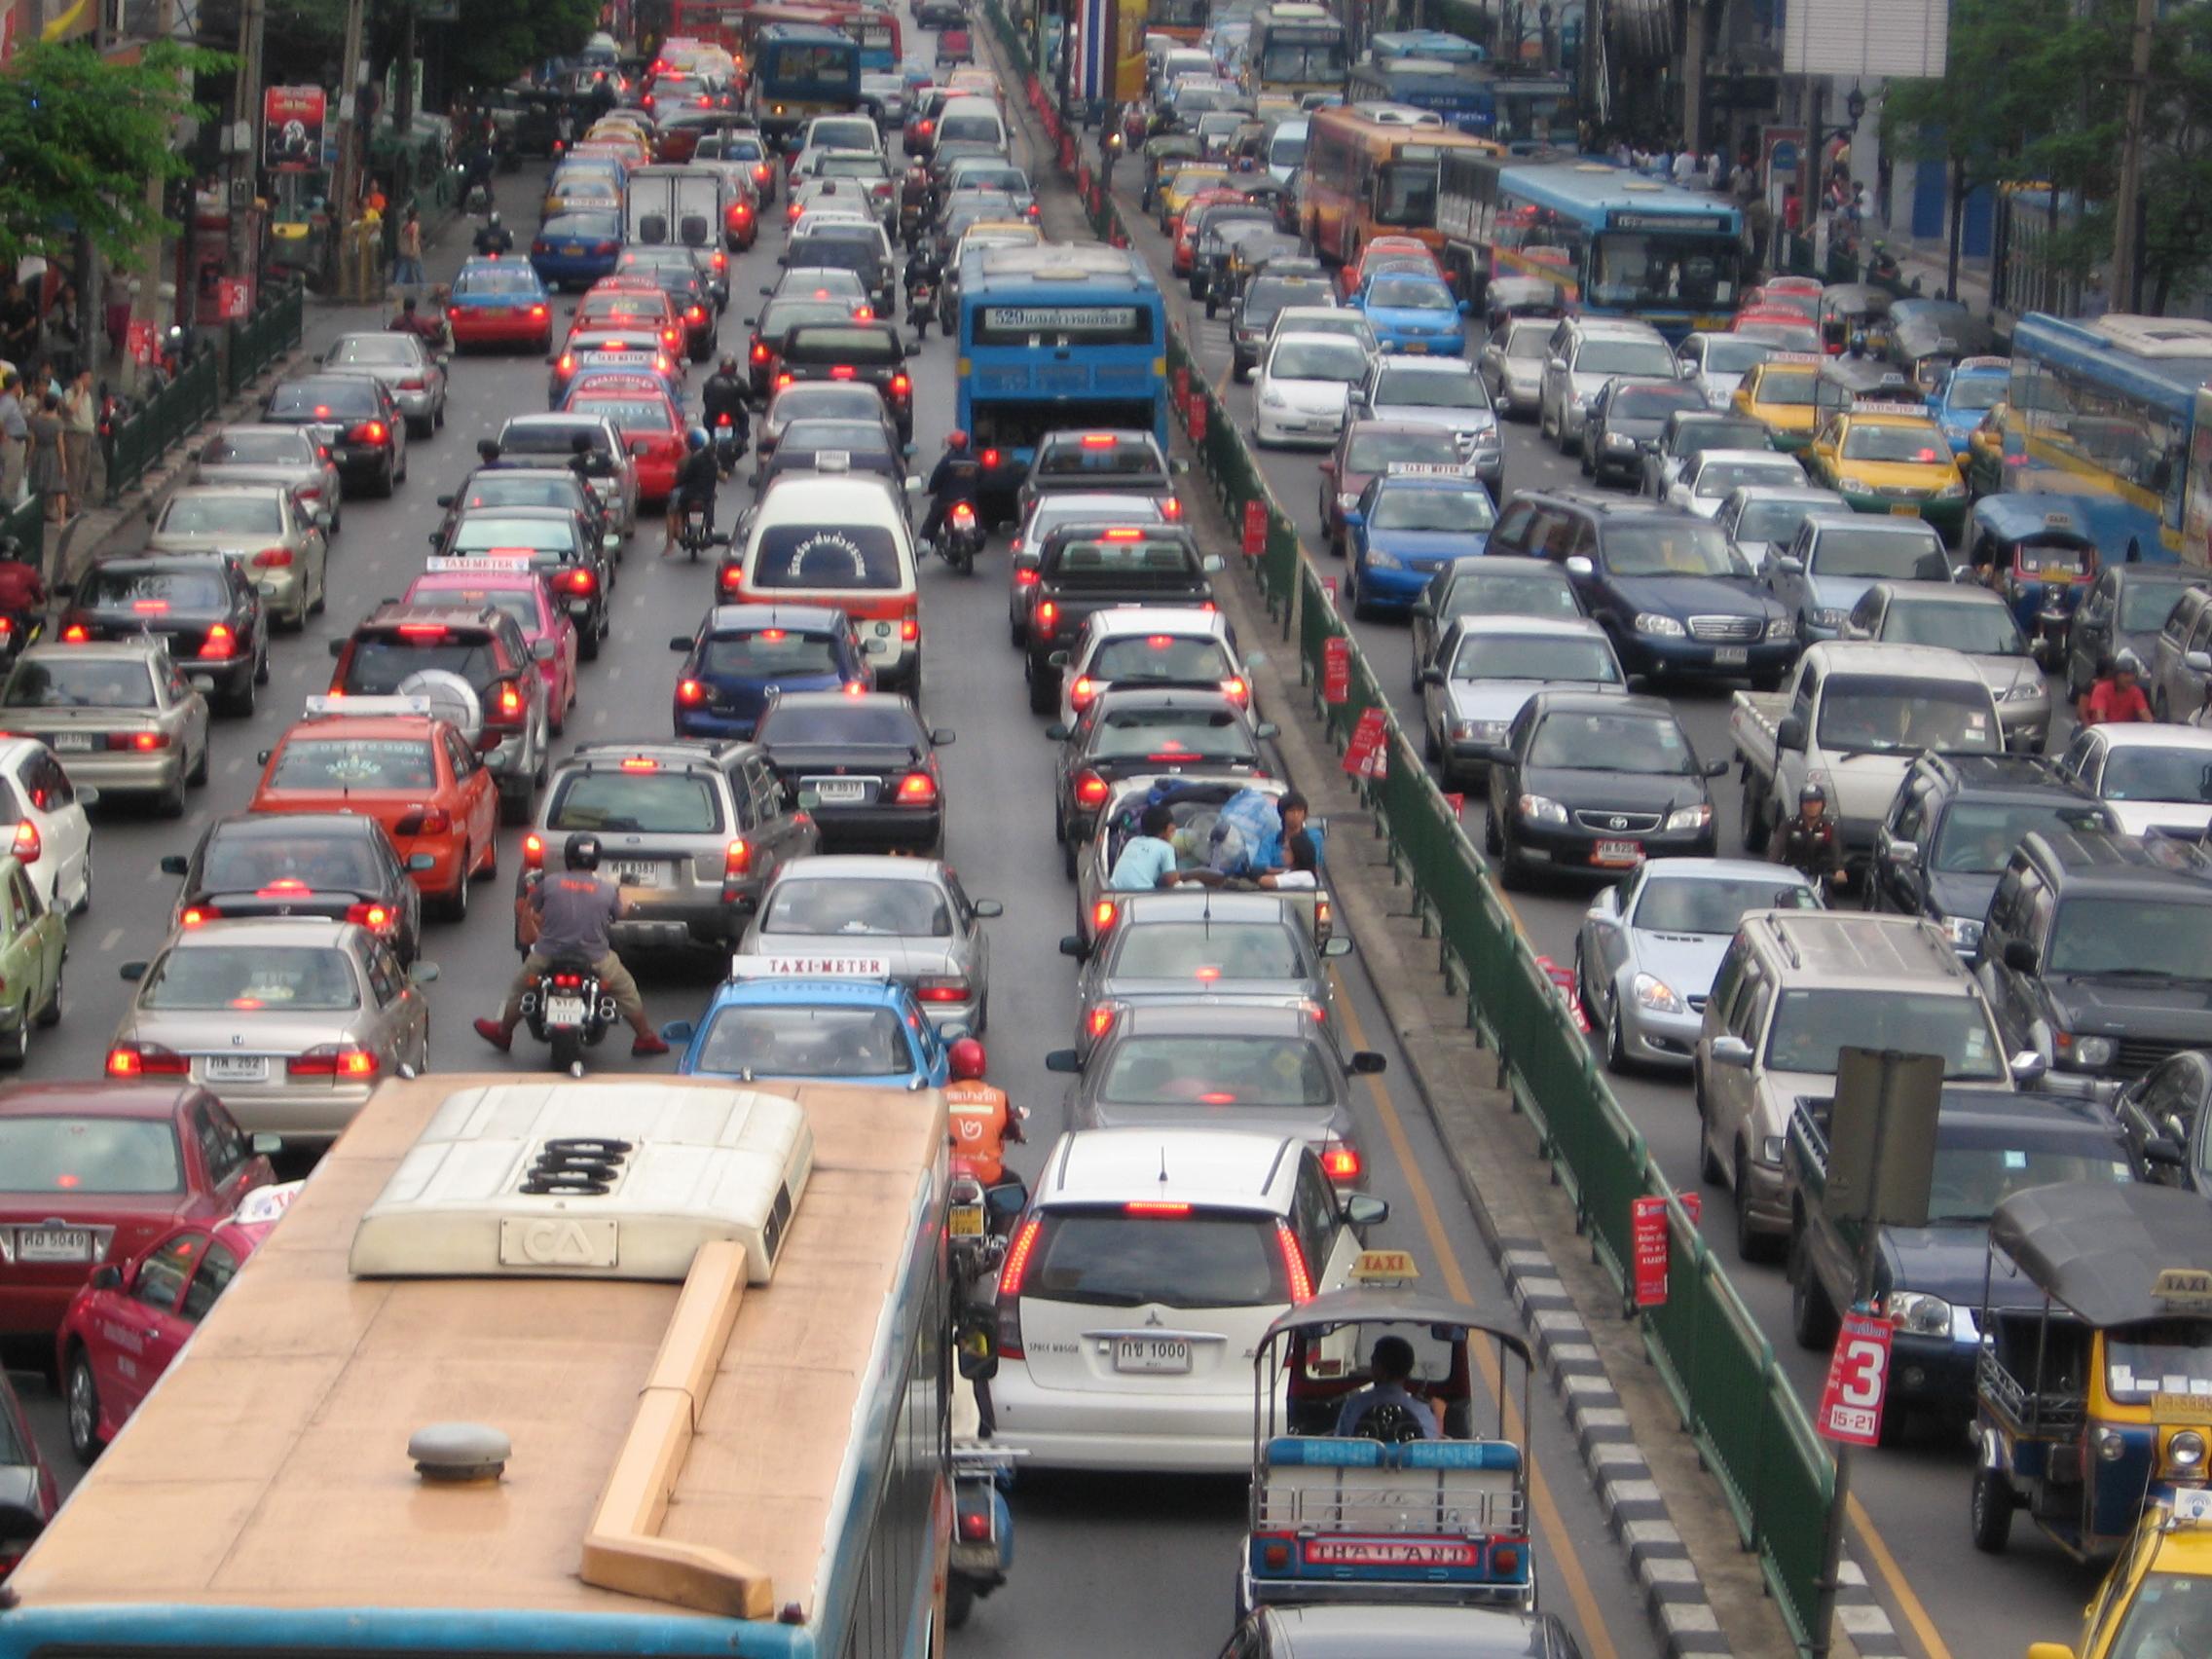 File:Bangkok traffic by g-hat.jpg - Wikimedia Commons